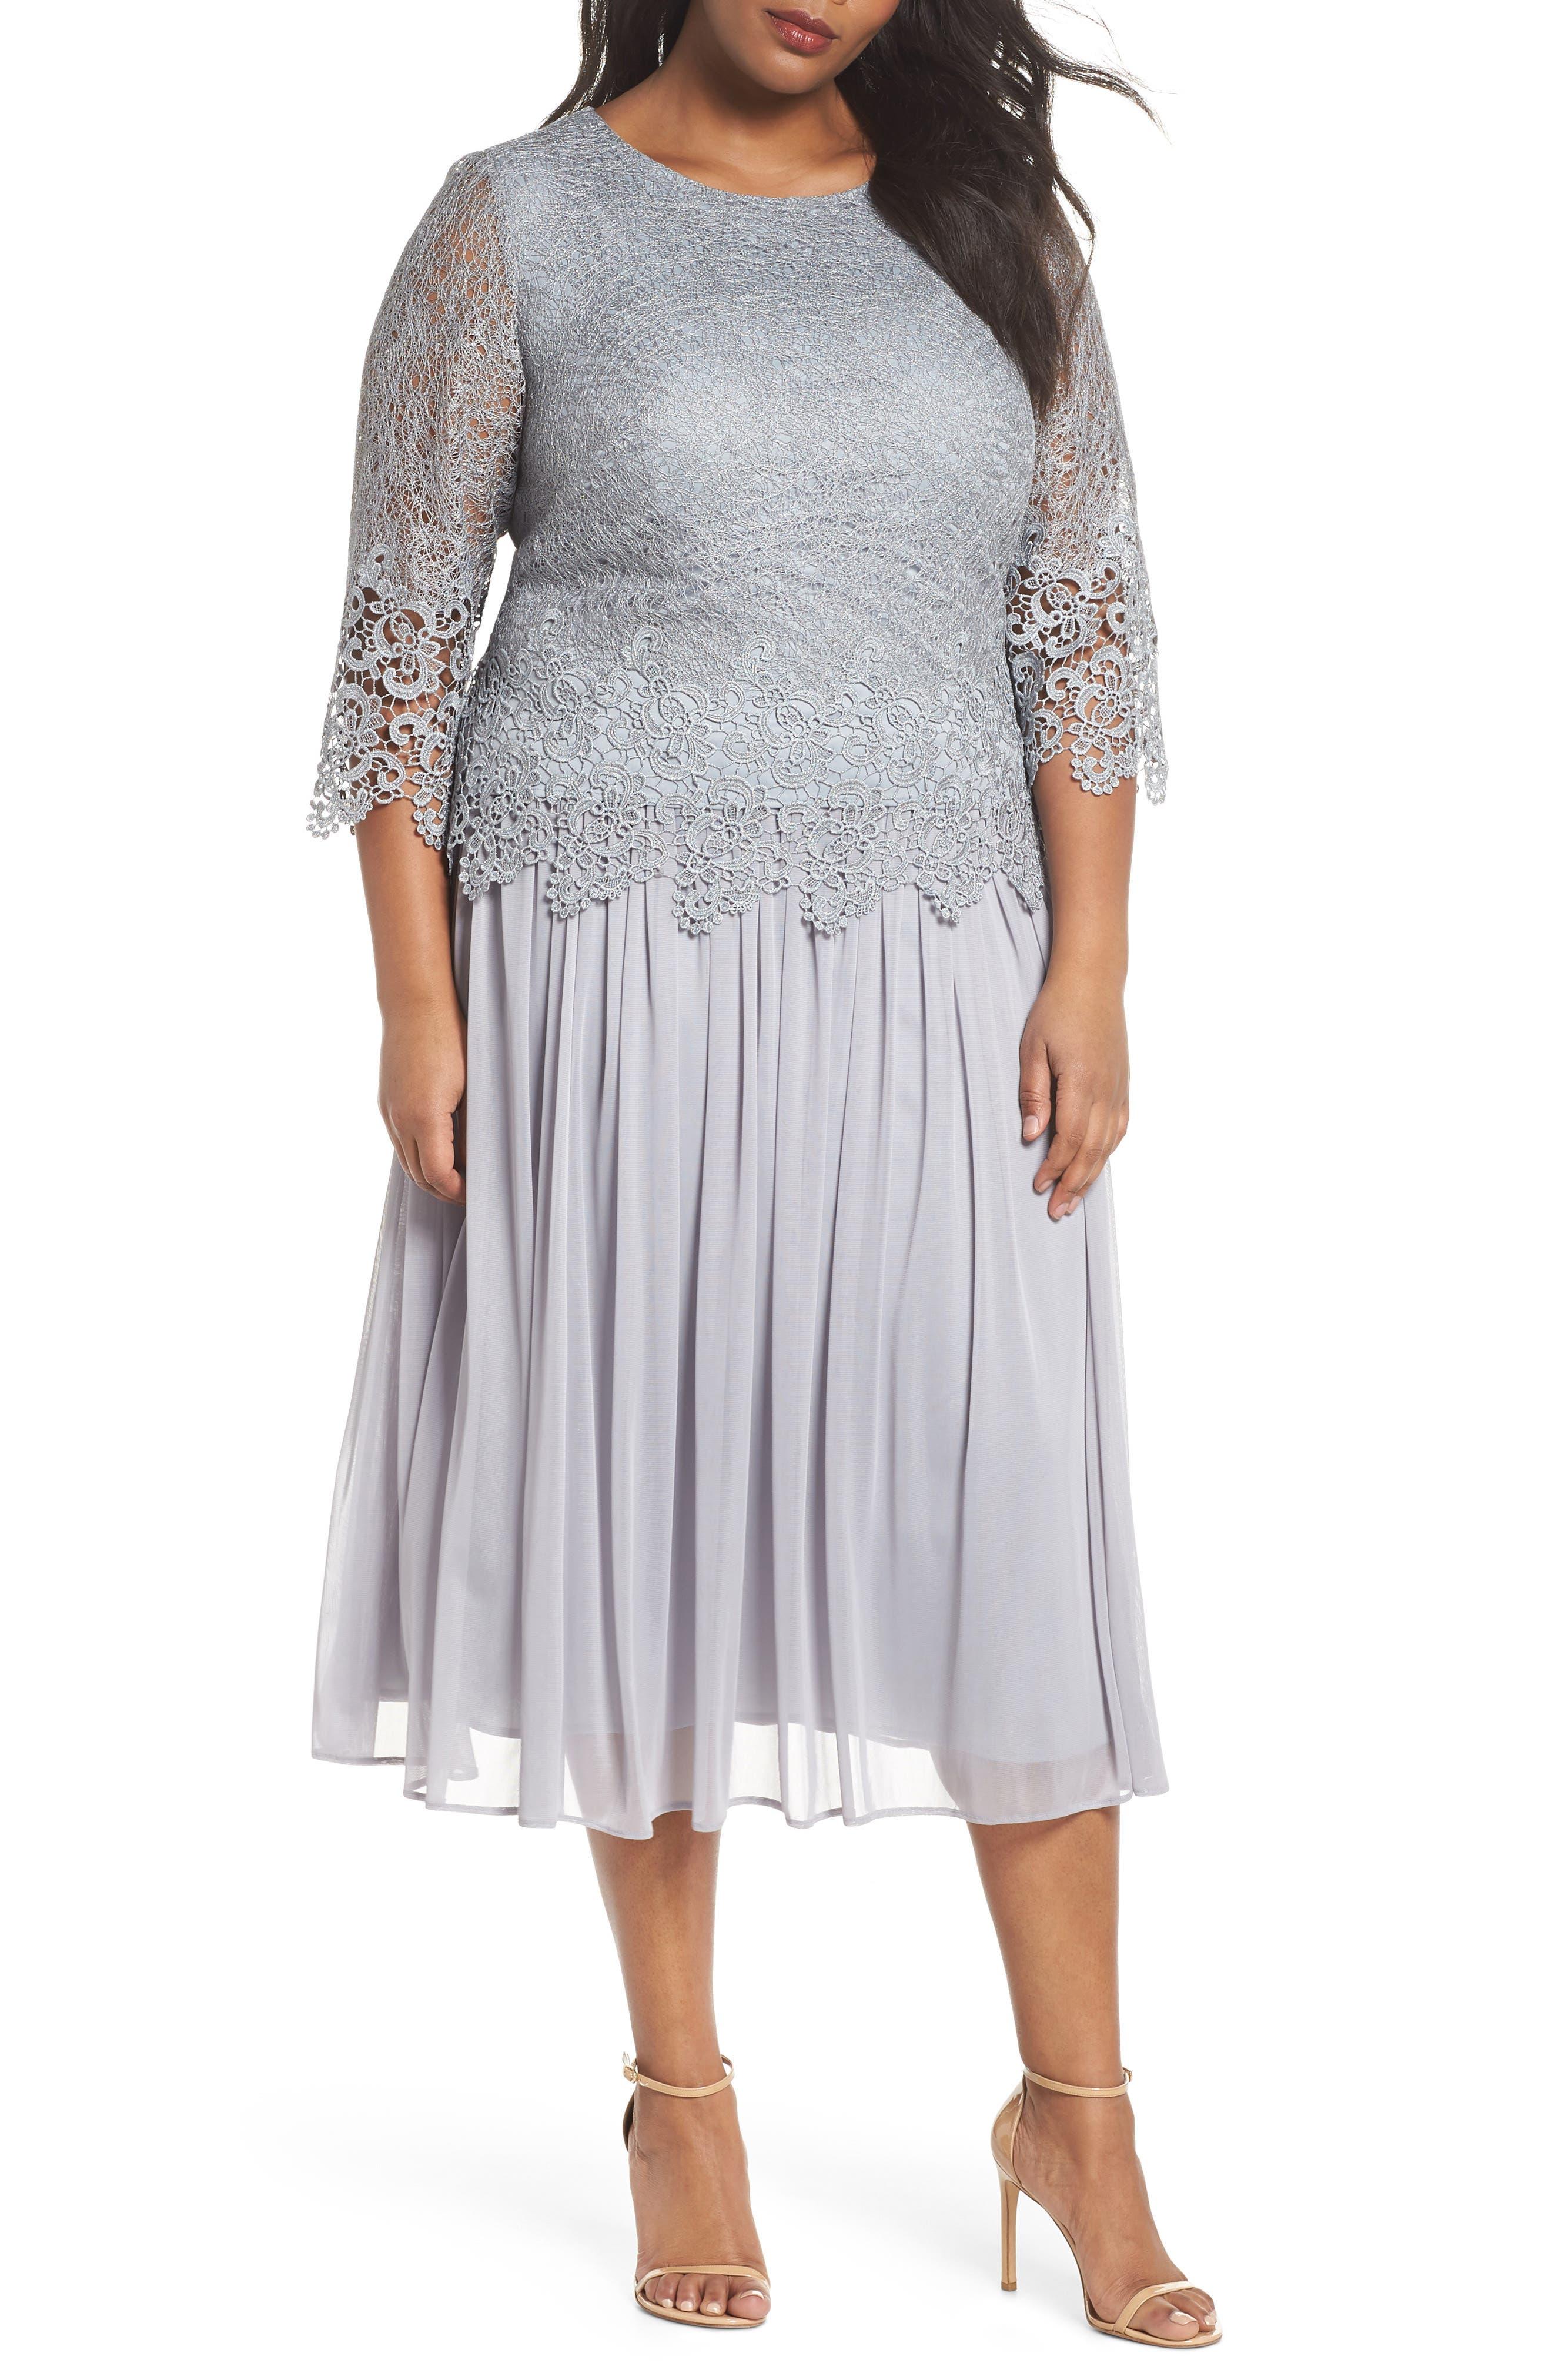 Lace & Chiffon Tea Length Dress,                             Main thumbnail 1, color,                             Silver